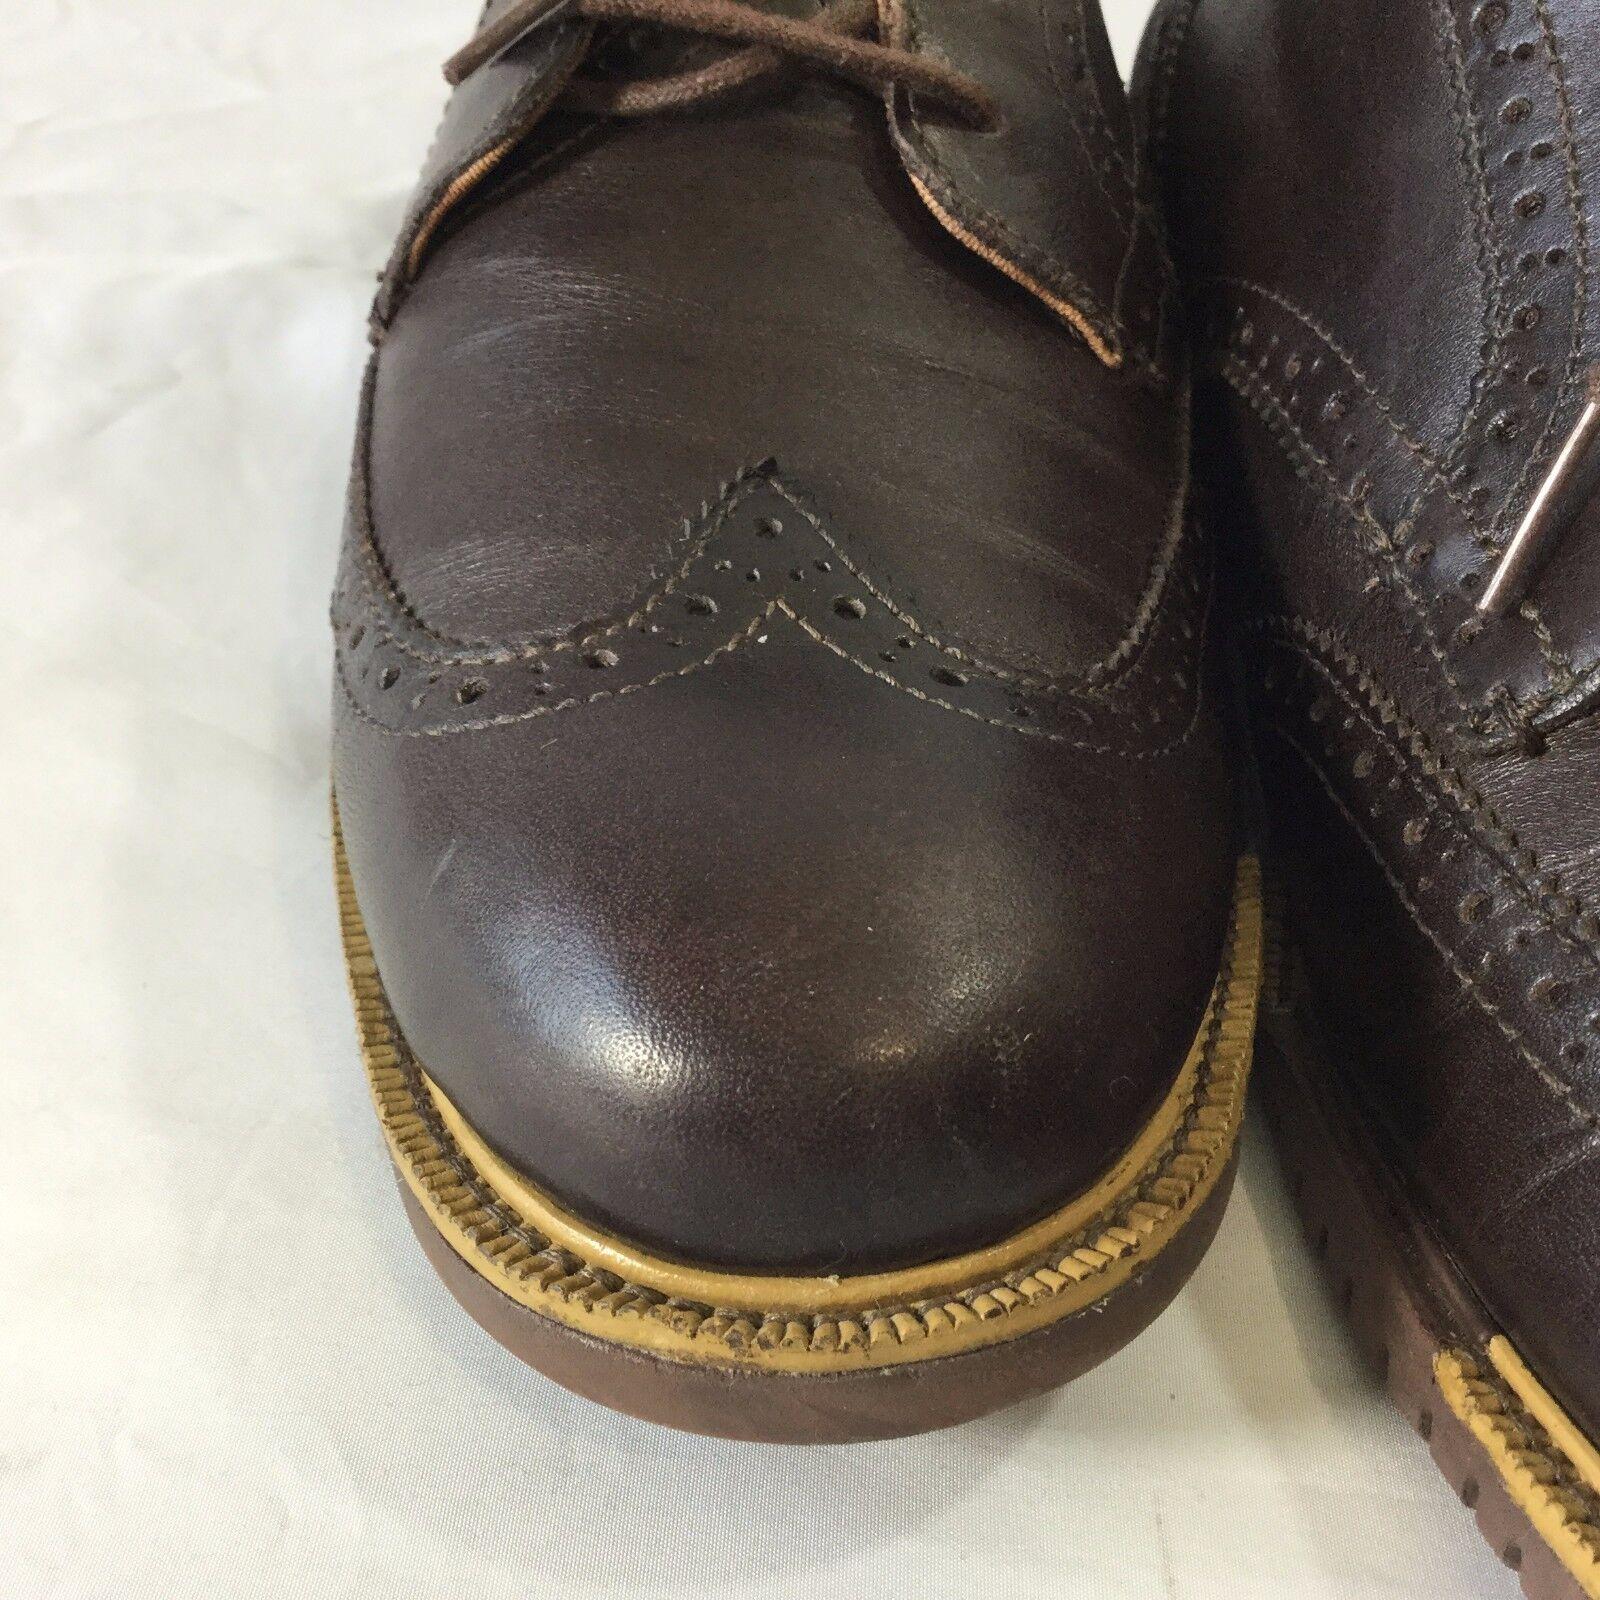 Cole Haan Great Great Great Jones schuhe Größe 10 M Oxford Wingtip braun Lace Up C22004 a7303f